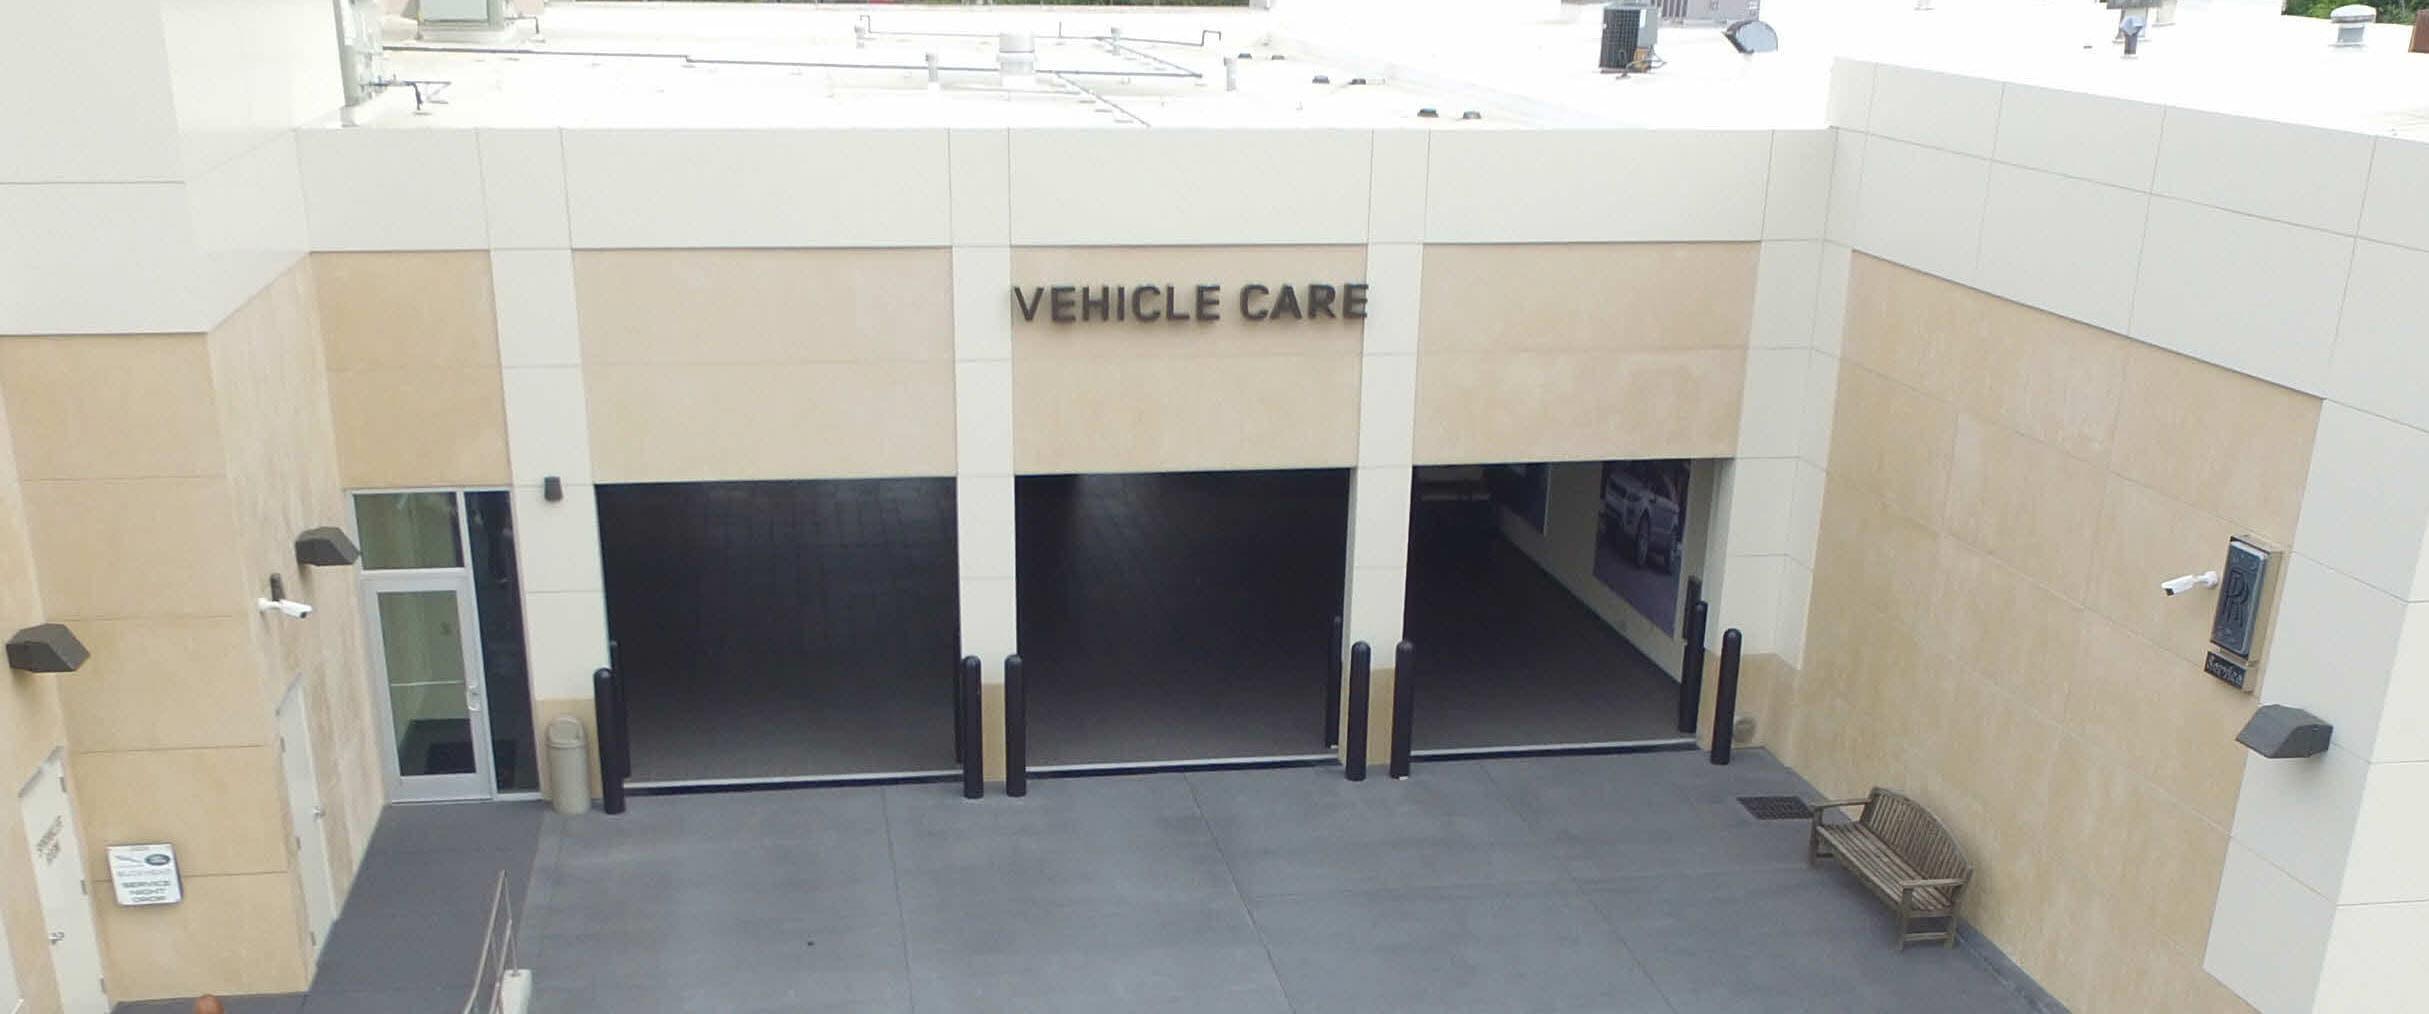 porsche used for thumbnail north boxster atlanta ga dealershowroom new ratings jaguar cars hennessy sale